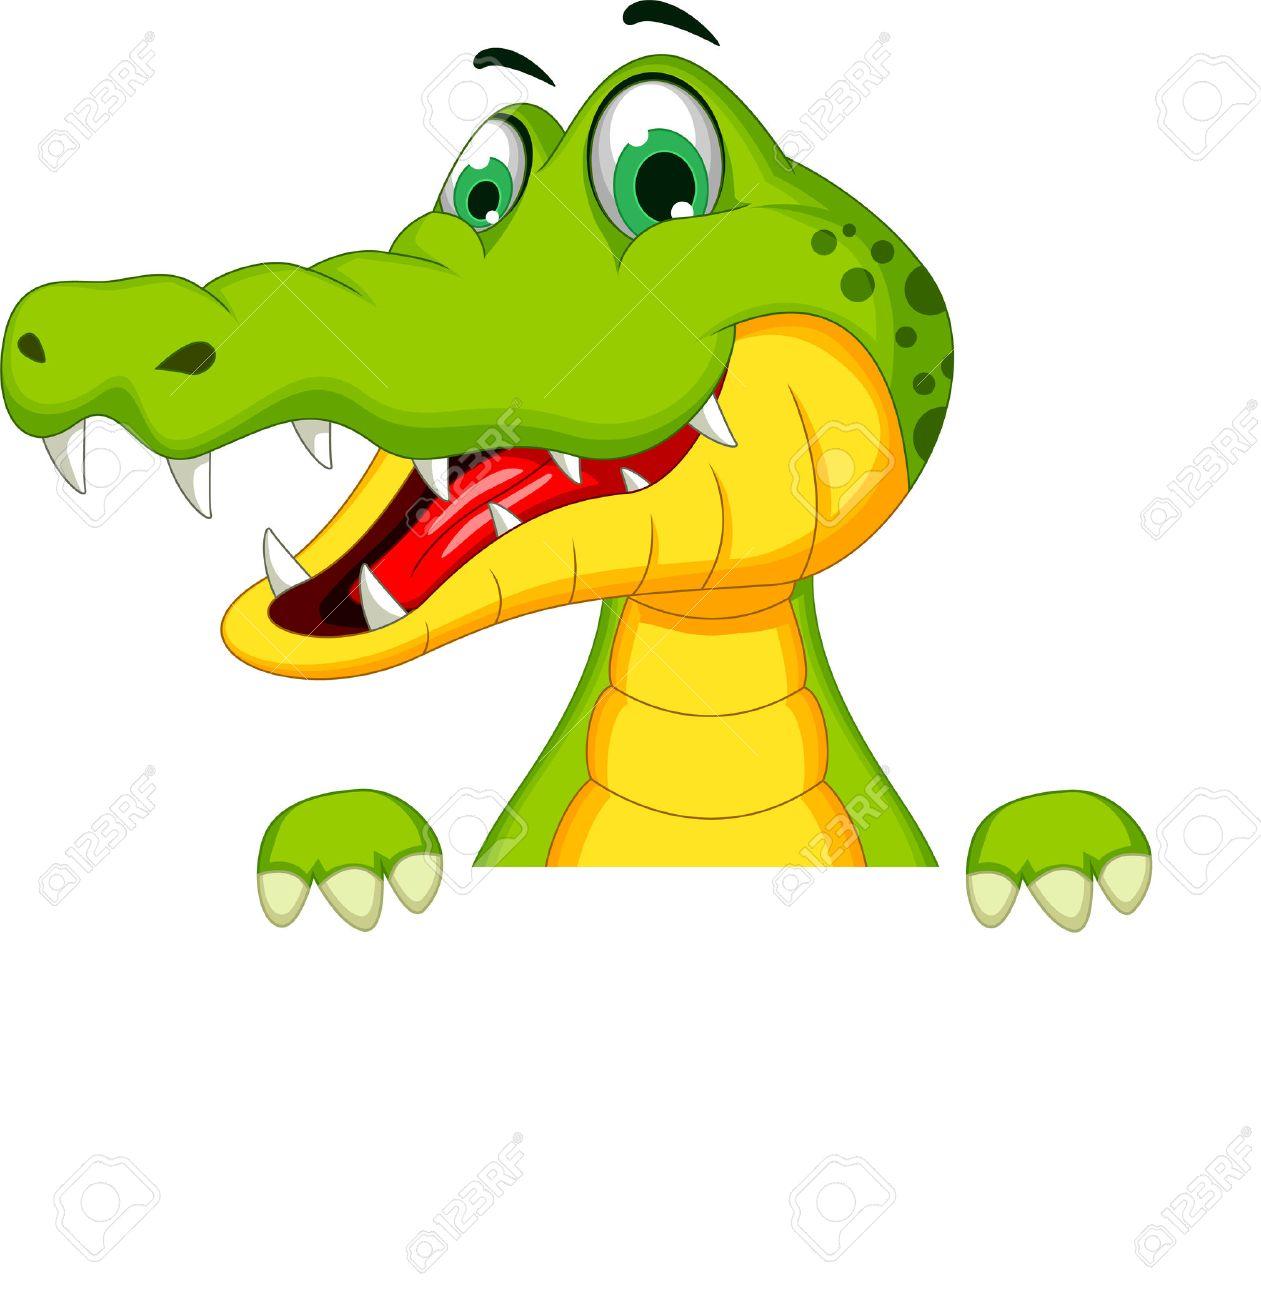 Cartoon crocodile holding blank sign - 38016682